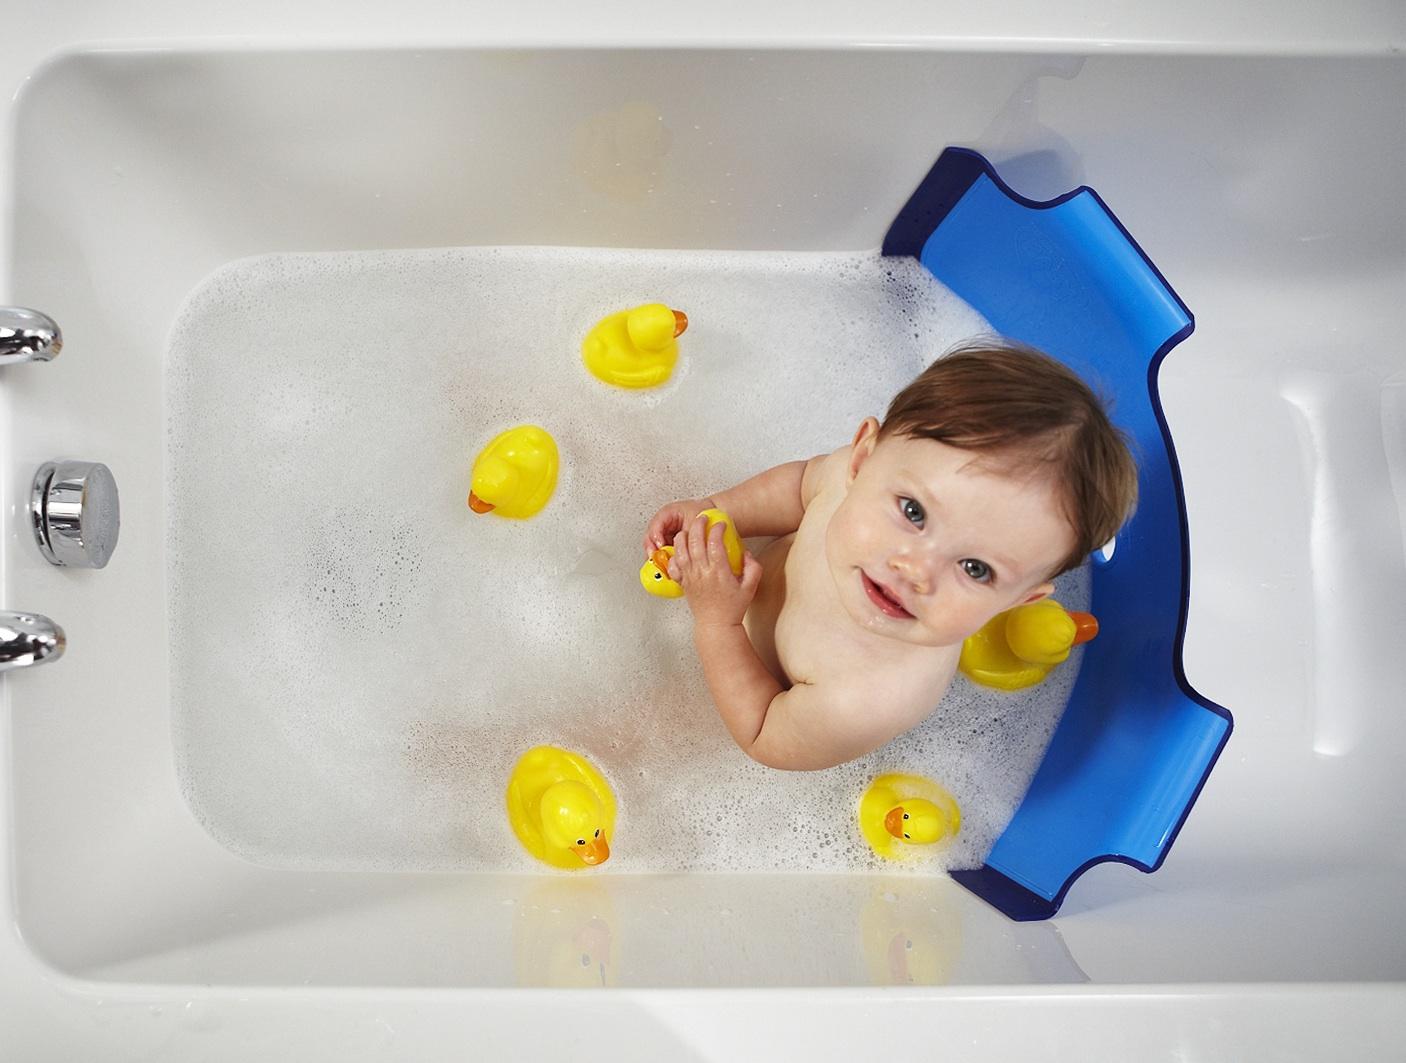 Innovative Baby Bath Saver | Indiegogo